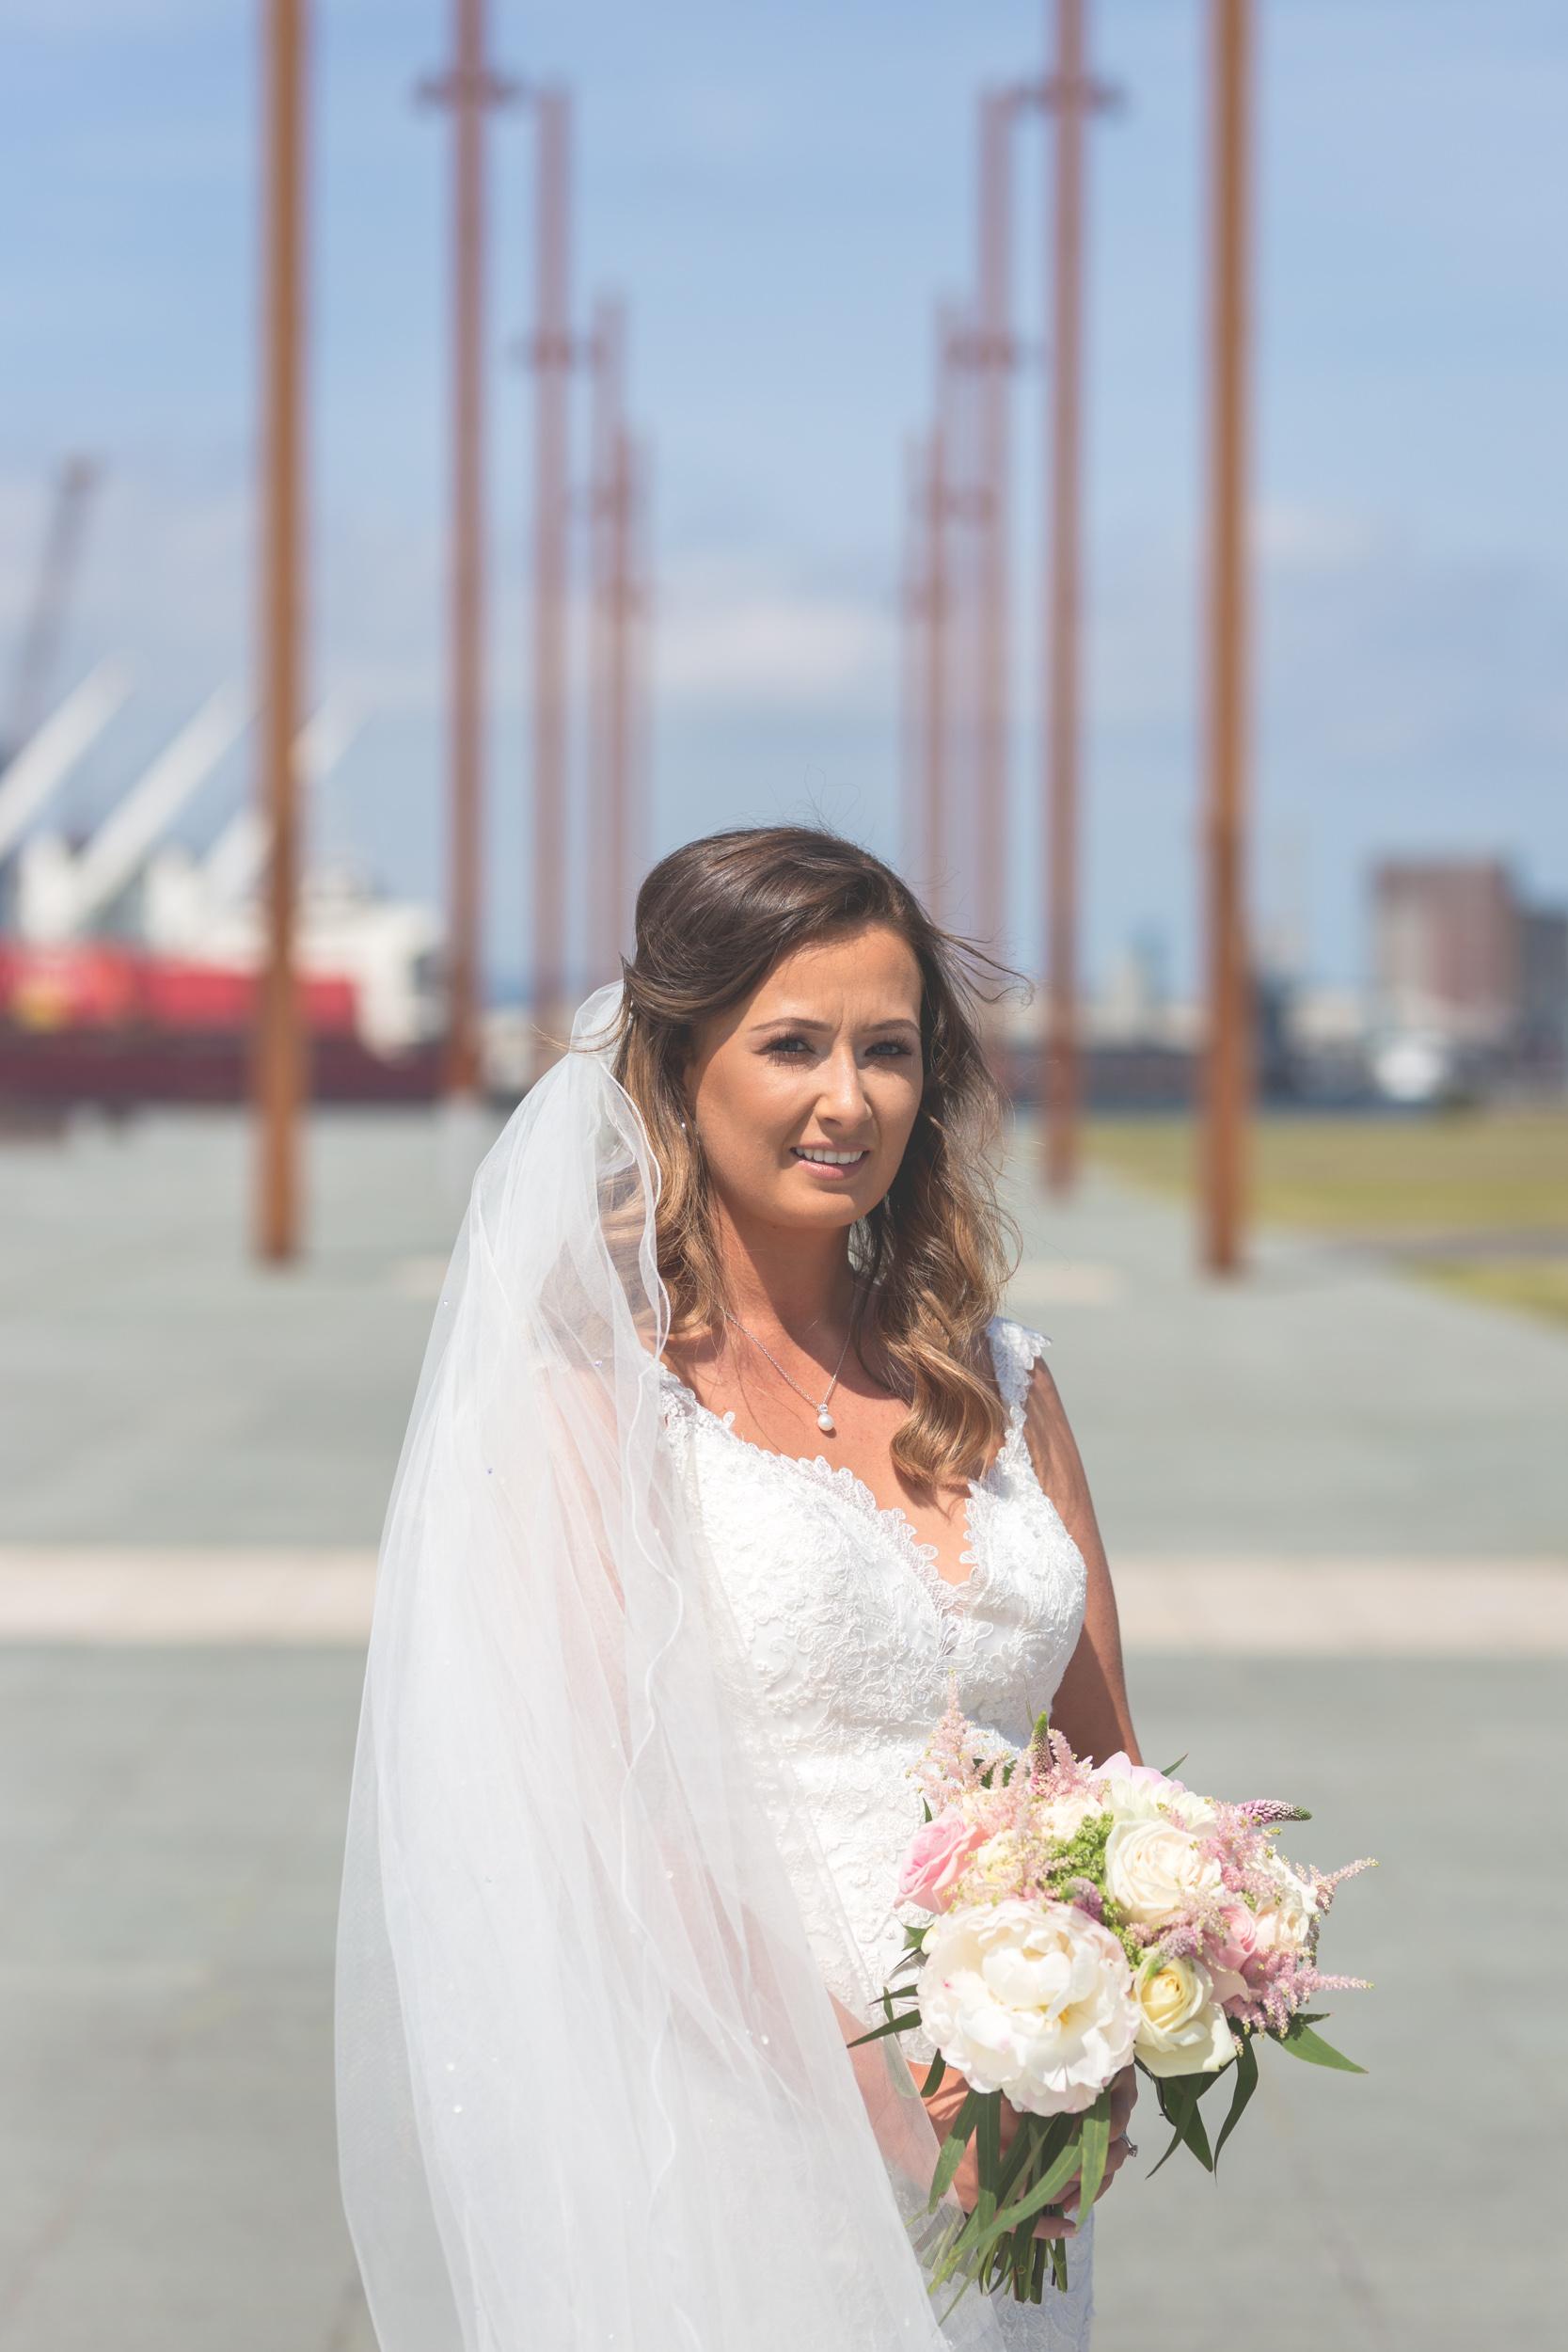 Brian McEwan   Northern Ireland Wedding Photographer   Rebecca & Michael   Portraits-41.jpg